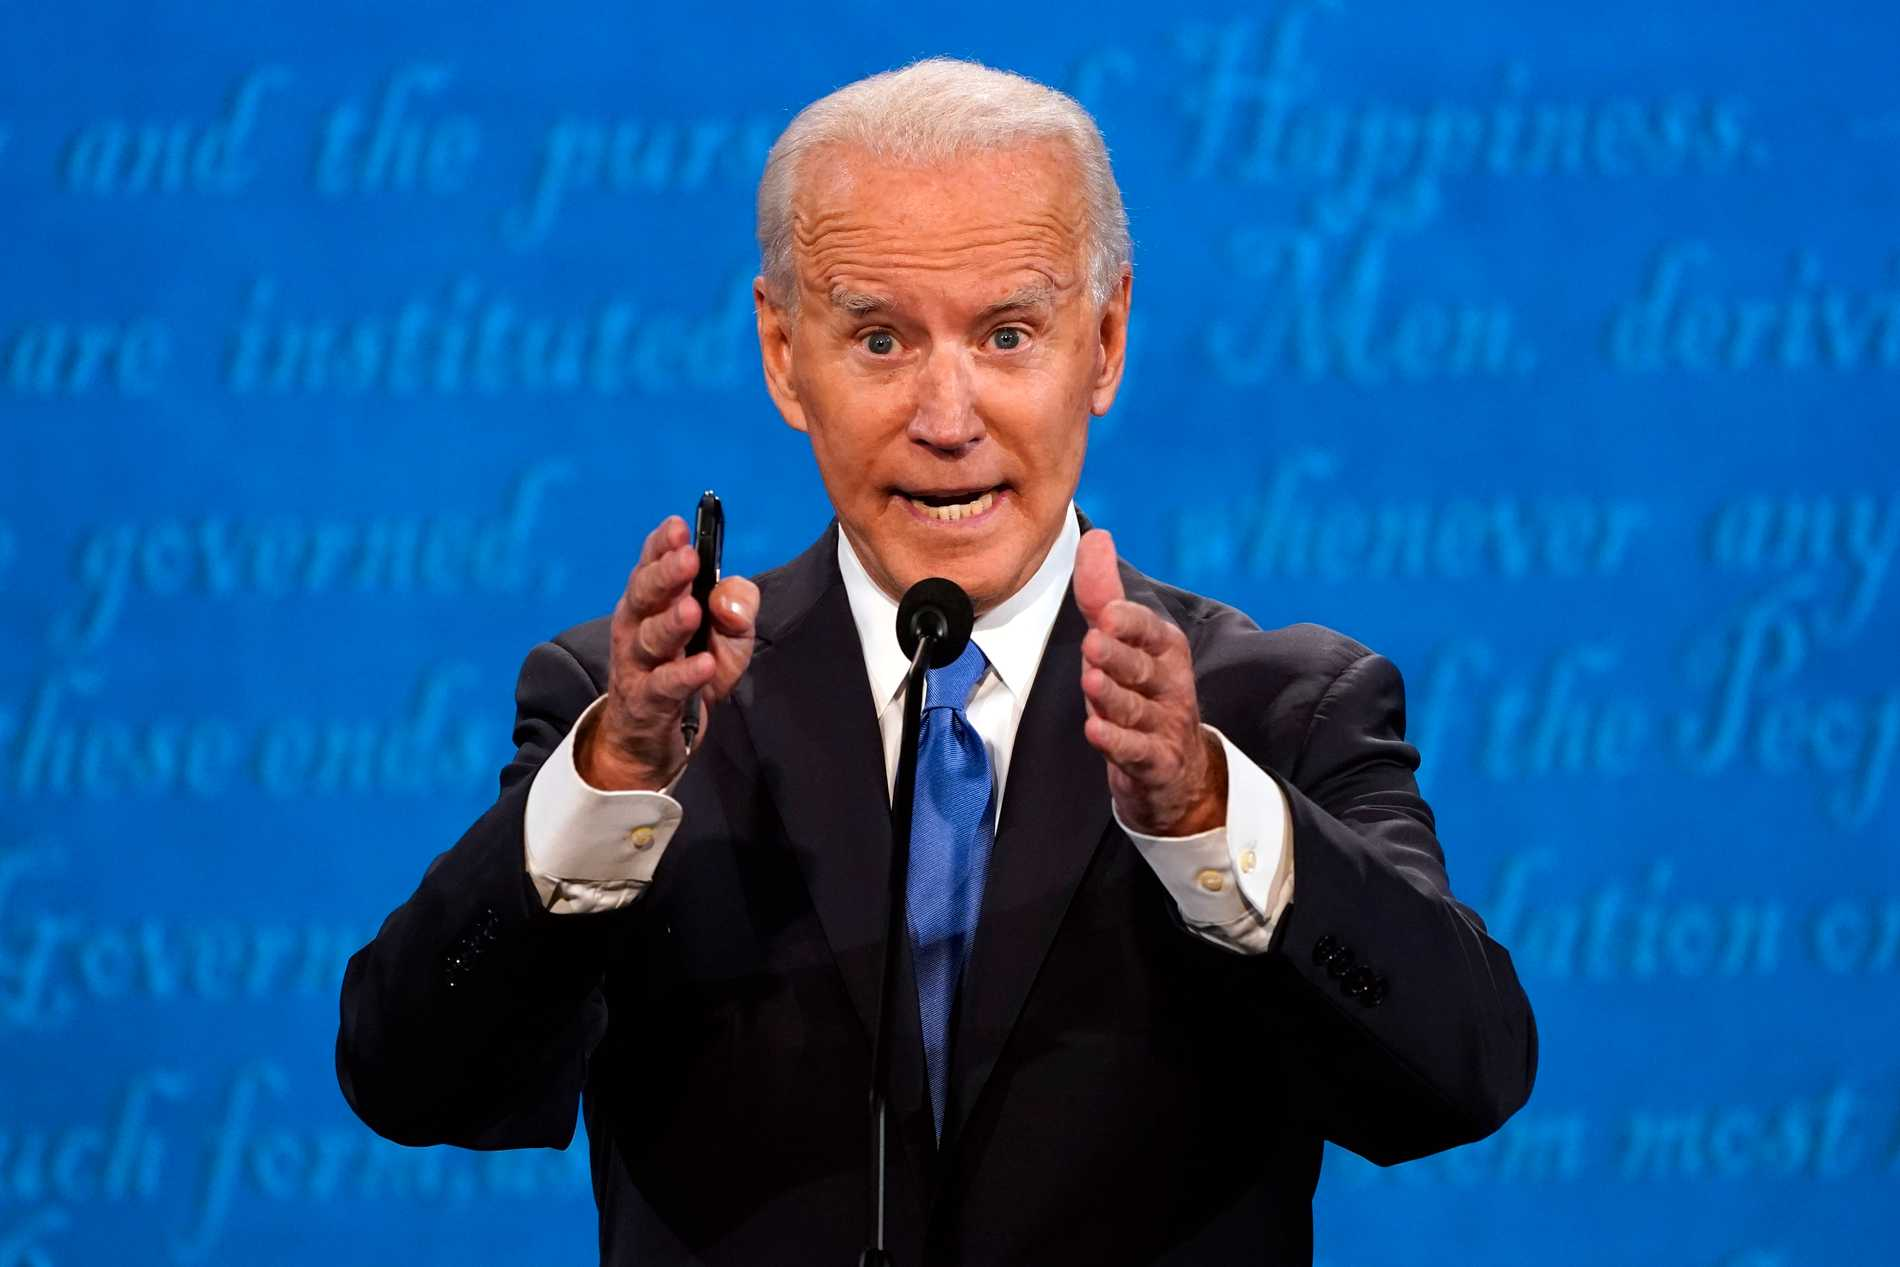 Joe Biden undrade över Donald Trumps bankkonto i Kina.